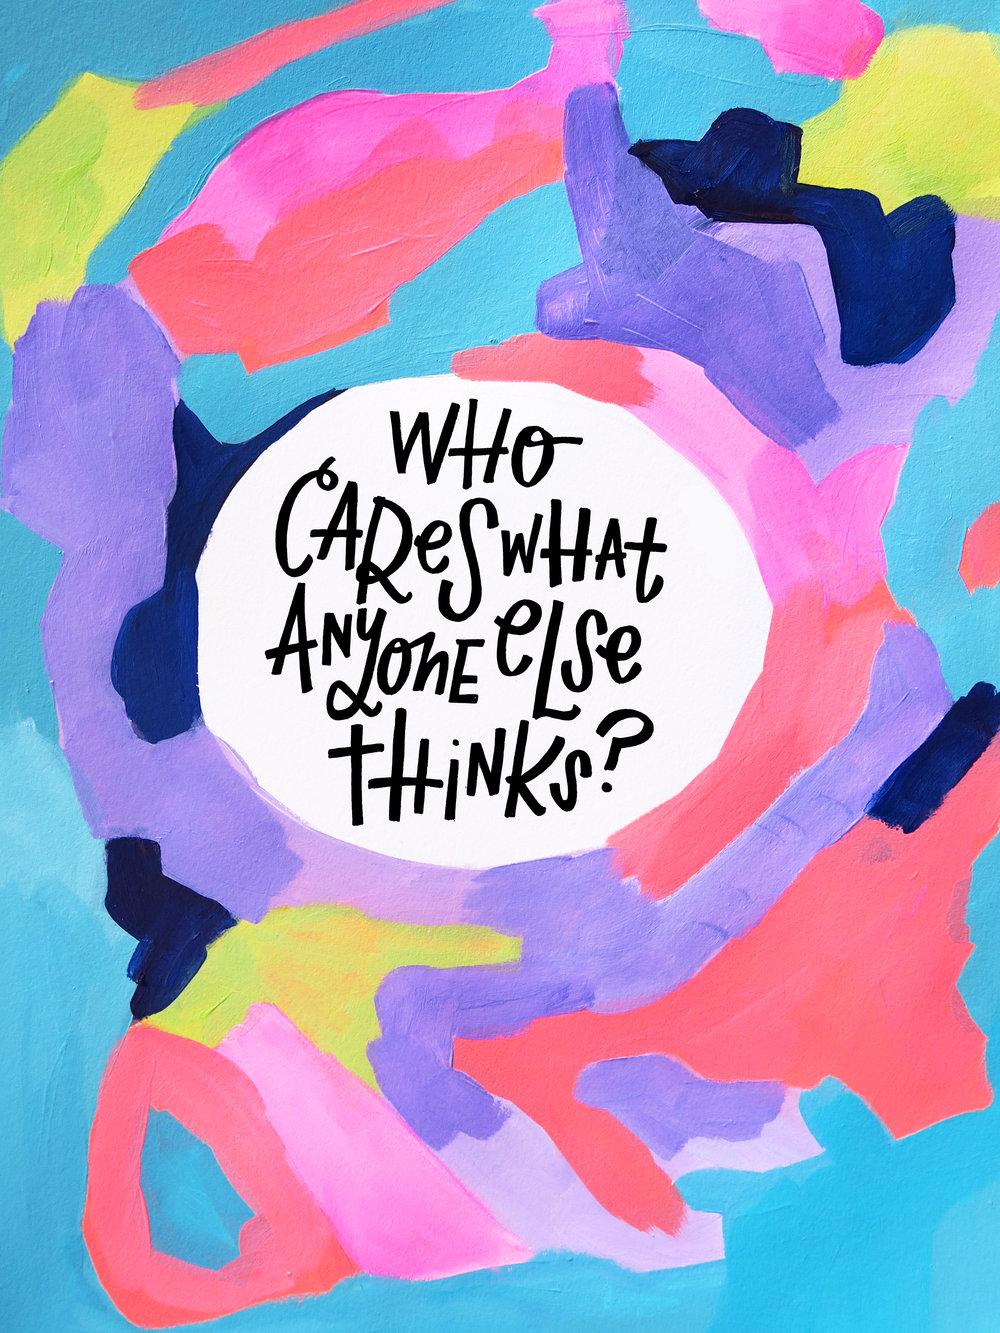 7/2/16: Think